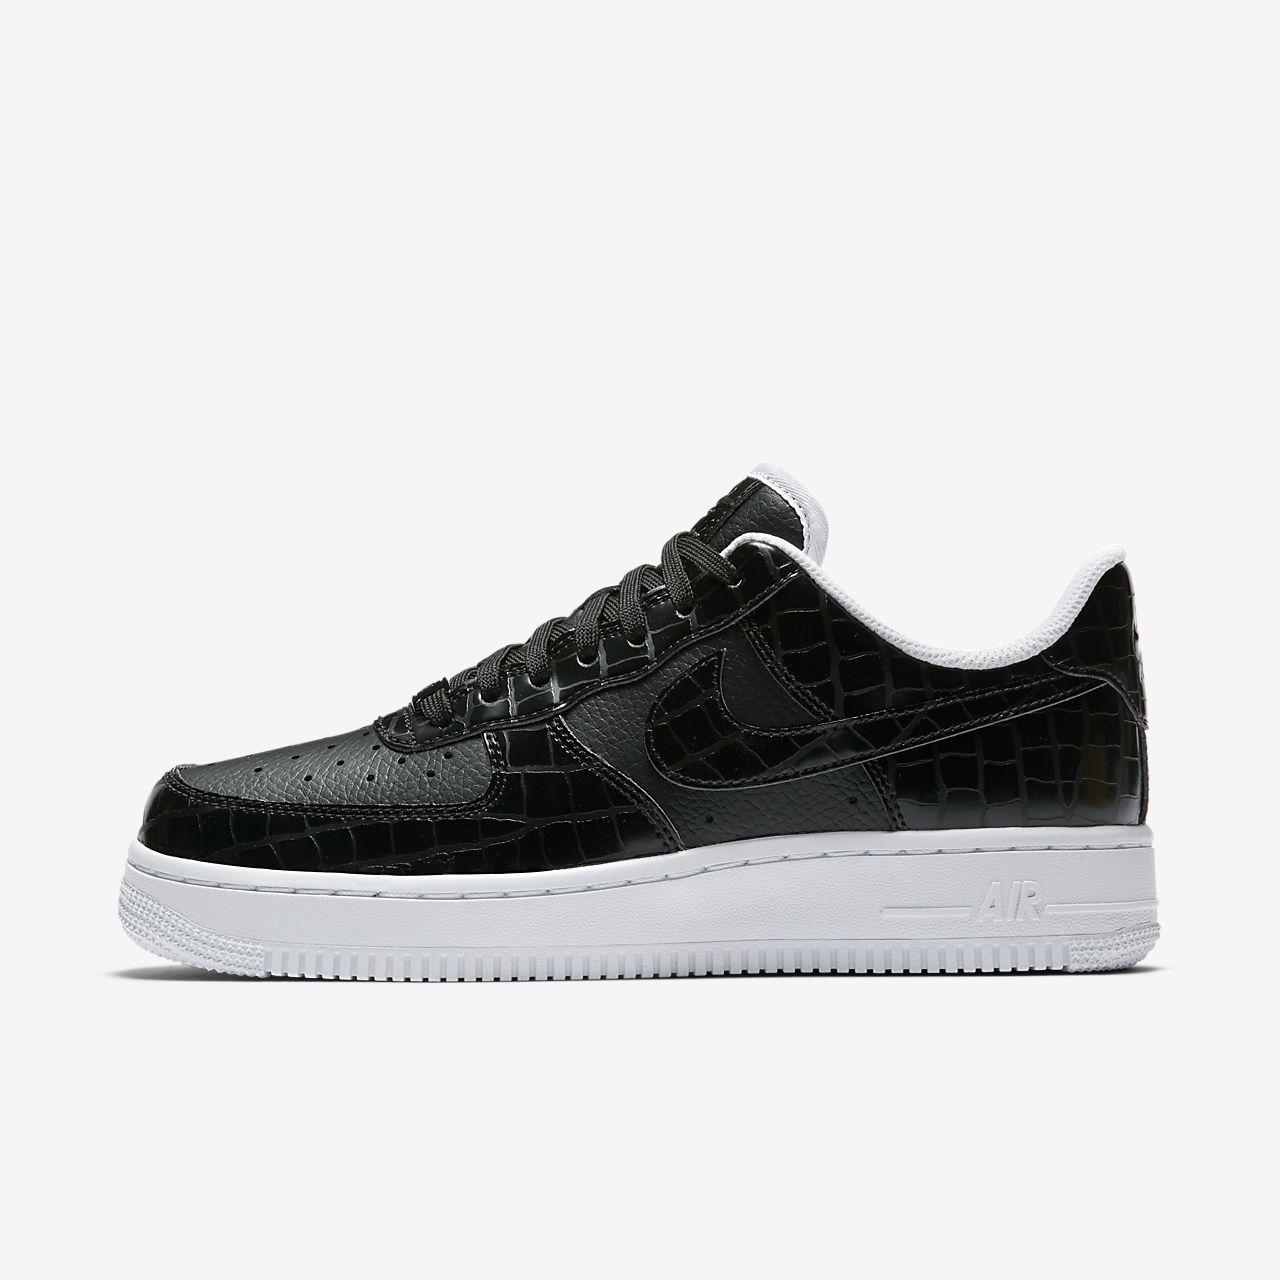 Nike - Son OF Force - Couleur: Blanc - Pointure: 42.5 bfQ2Boumk